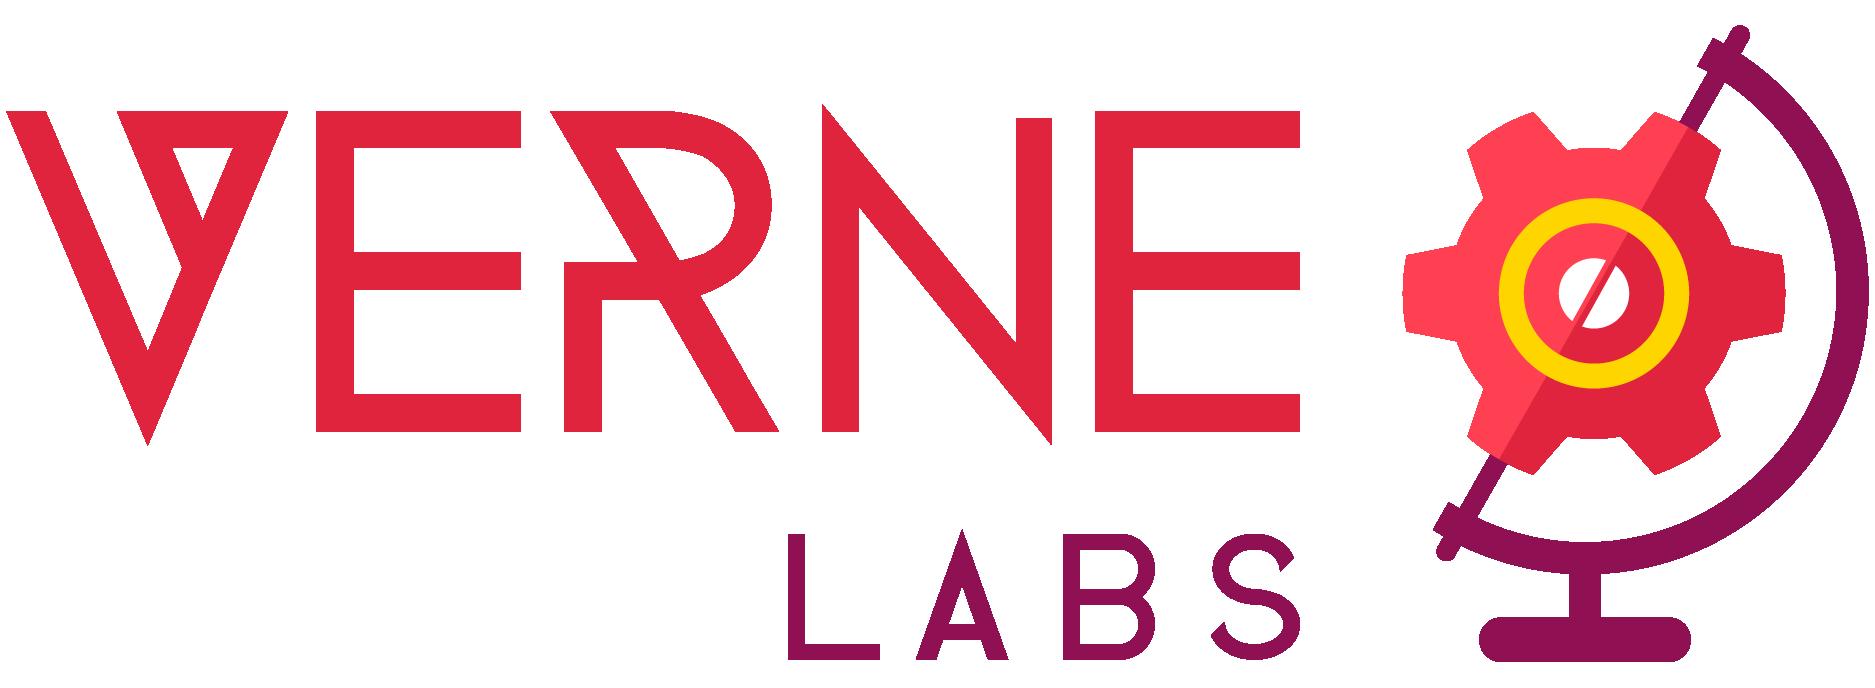 Verne Labs